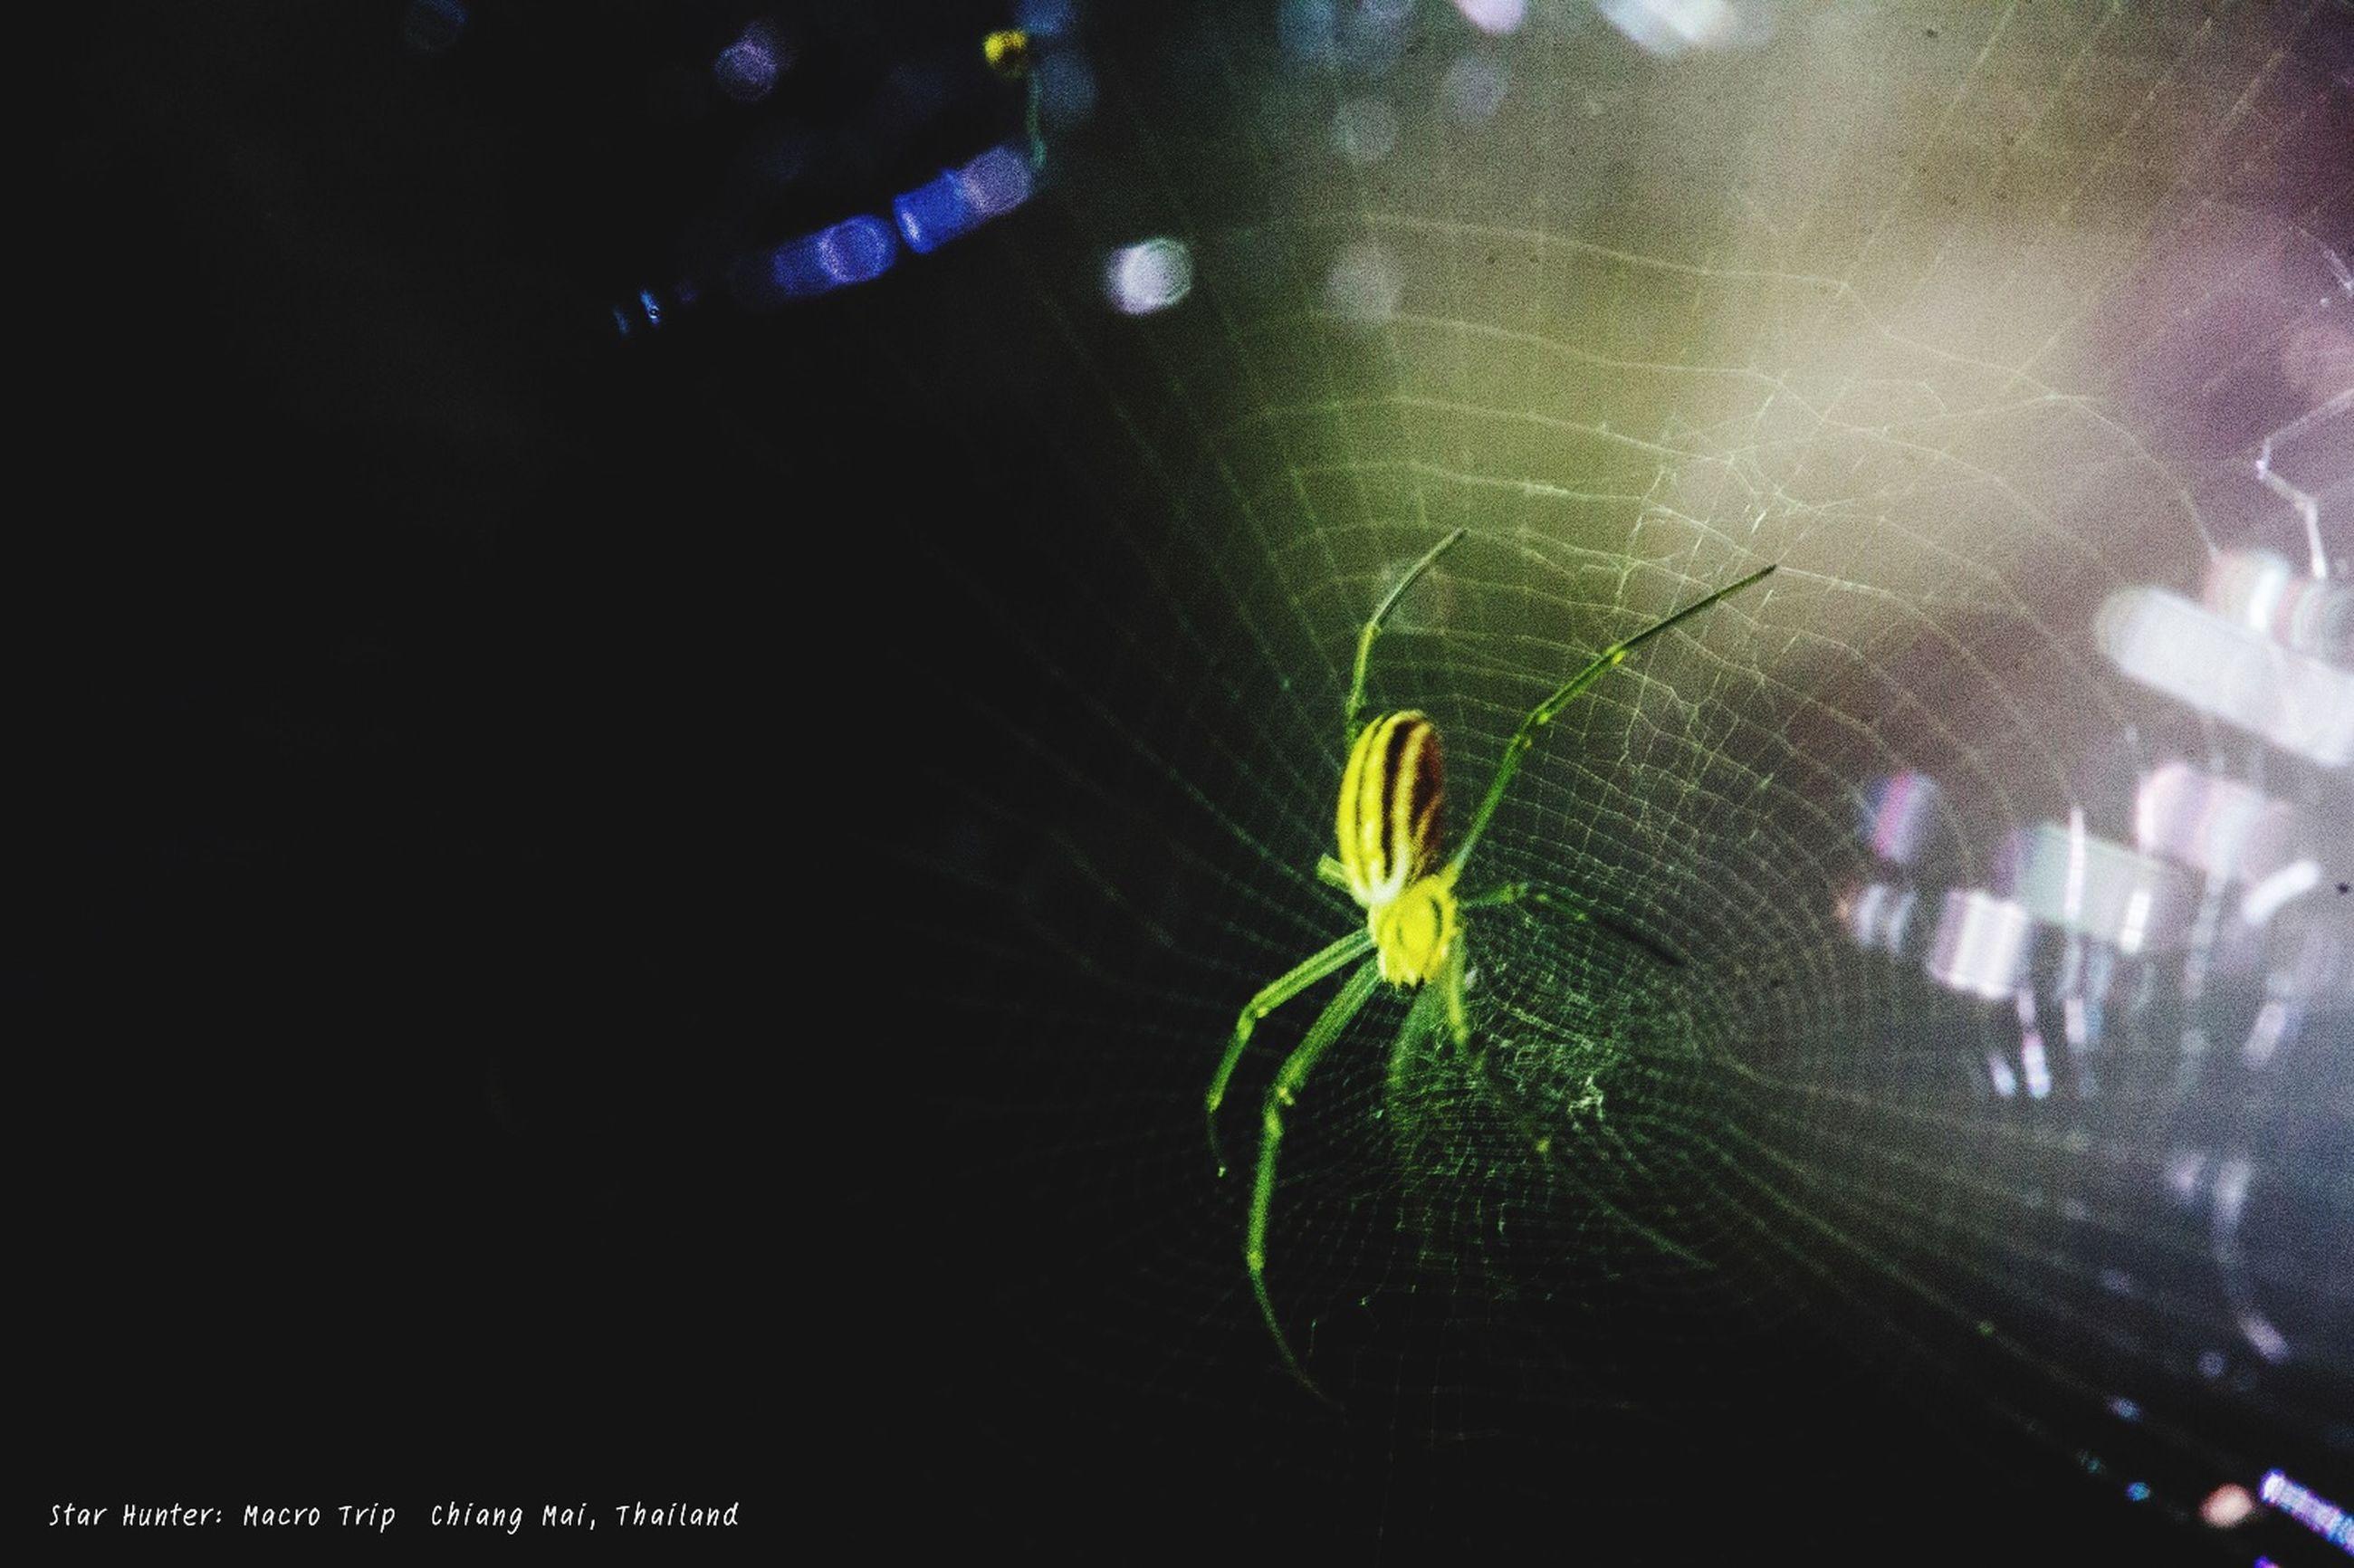 night, illuminated, indoors, animal themes, one animal, glowing, lighting equipment, blurred motion, dark, long exposure, spider web, motion, light - natural phenomenon, no people, close-up, wildlife, animals in the wild, spider, light